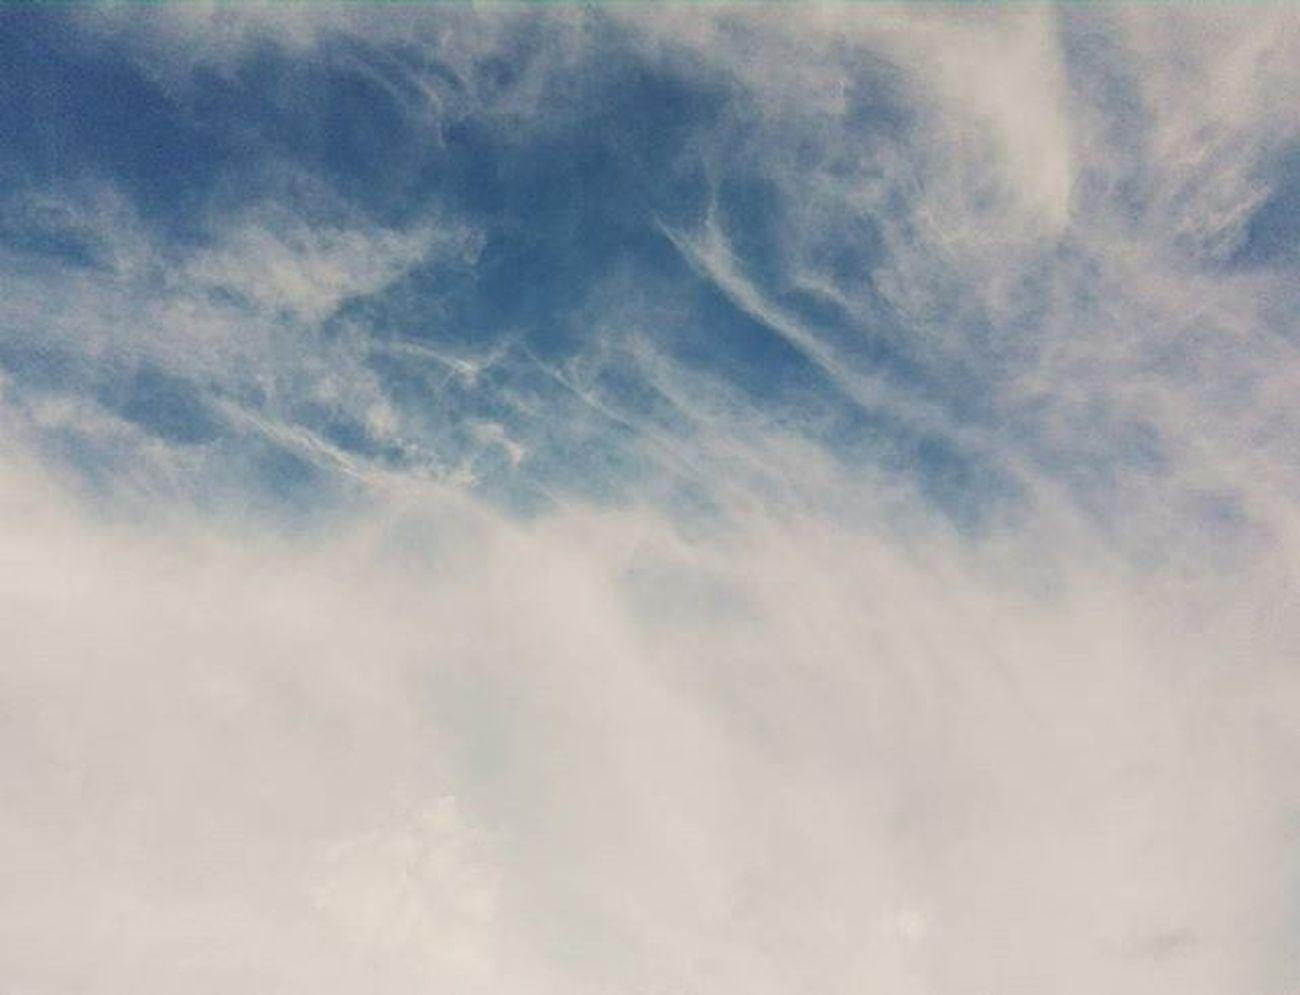 ☁ Beautiful Sky Amazing Cloud Wonderful Colors Photo Photooftheday Insta Instacloud Instasky Instalike Instagood Instadaily Instamood InstaVsco Photography Phone Huawei P8 P8lite VSCO Vscocam Vscosky vscogood vscophile vscoczenature vscocze vscoczech